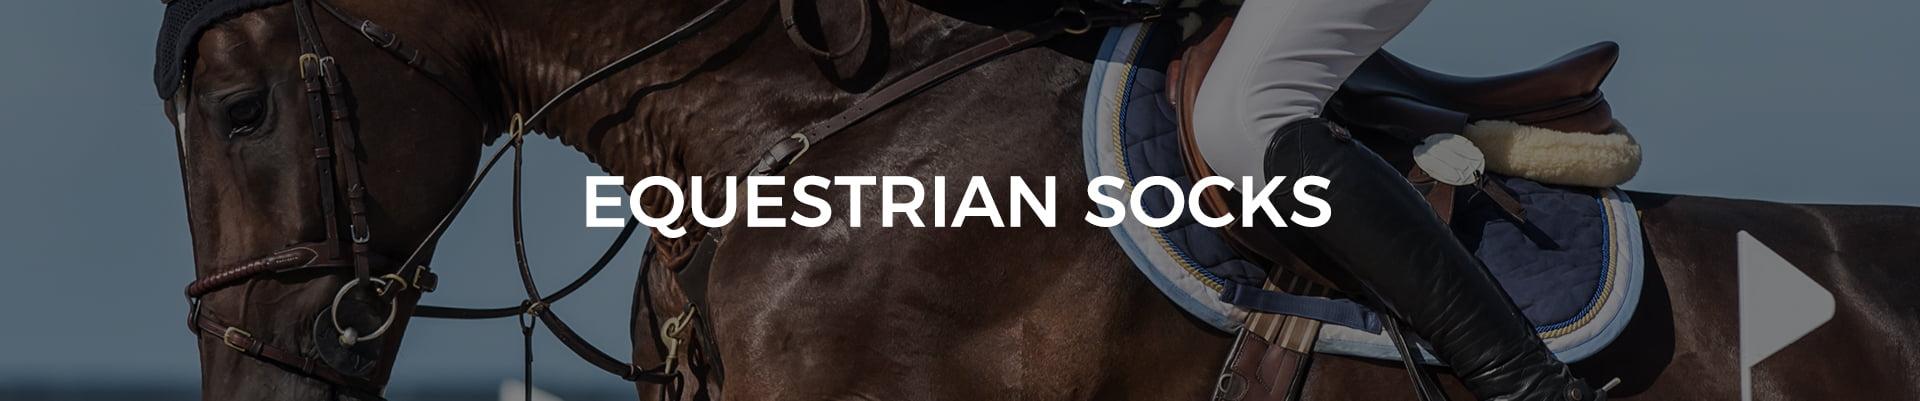 Equestrian socks